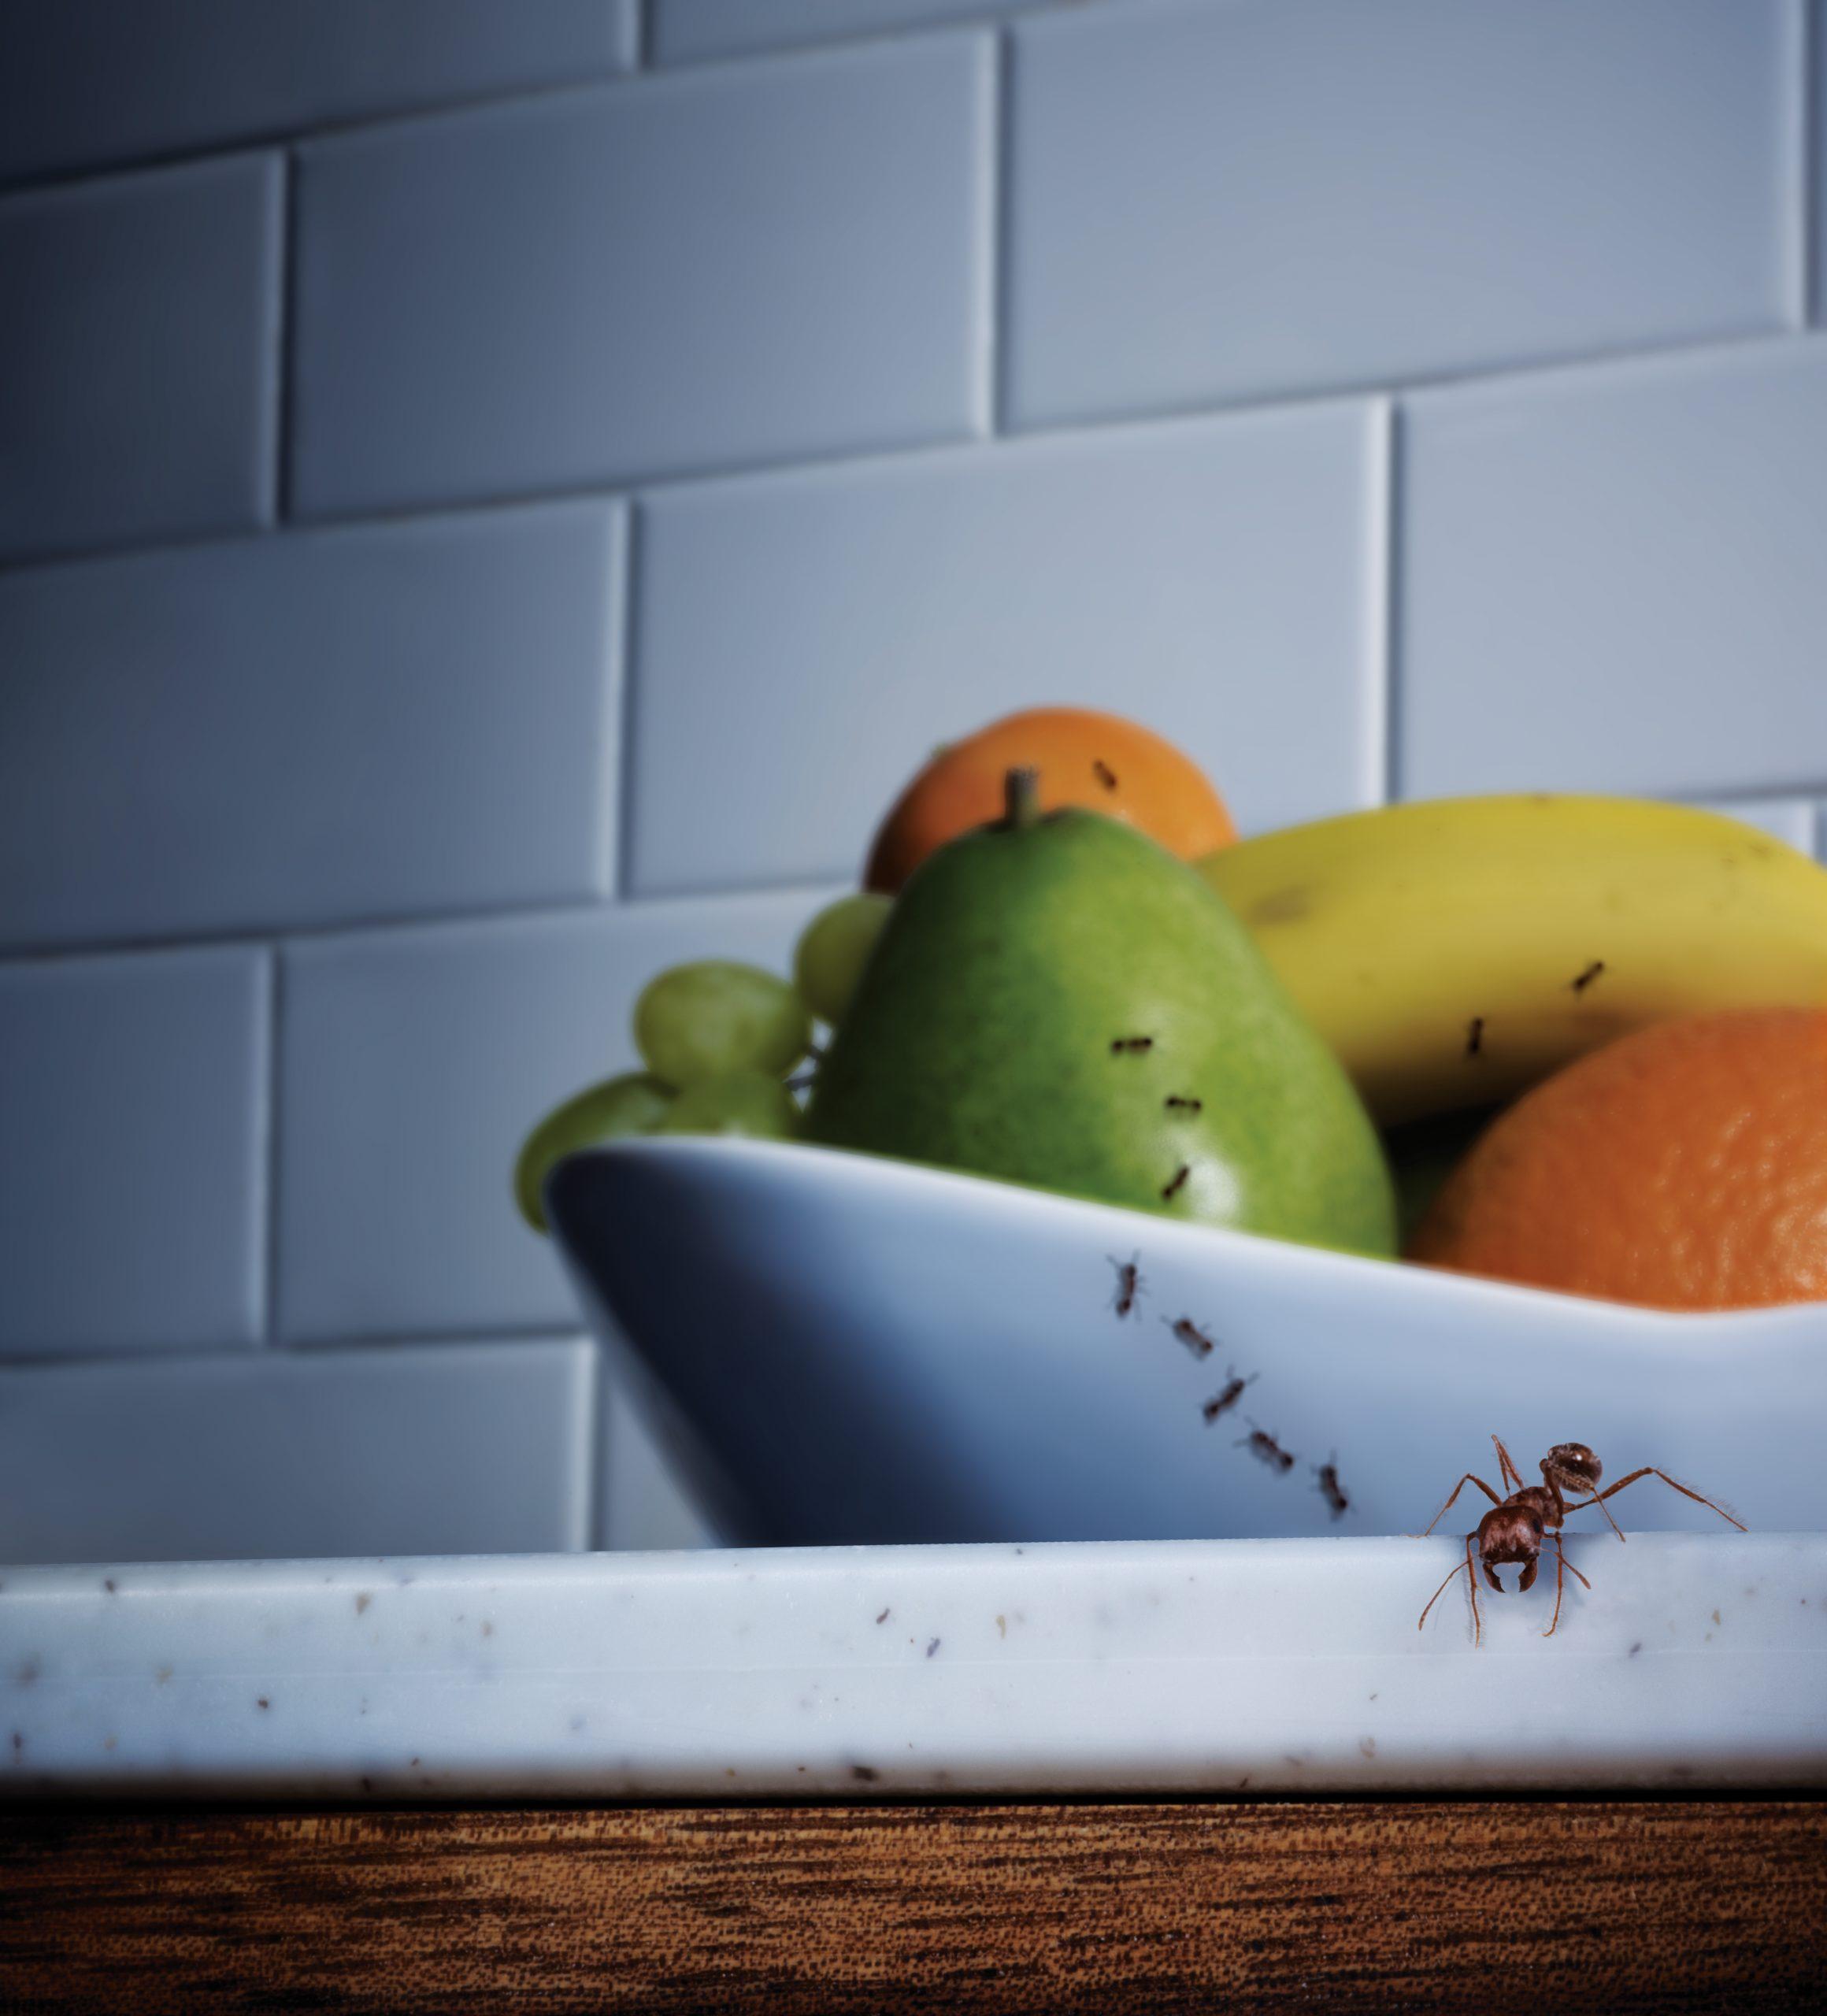 pantry pests on fruit